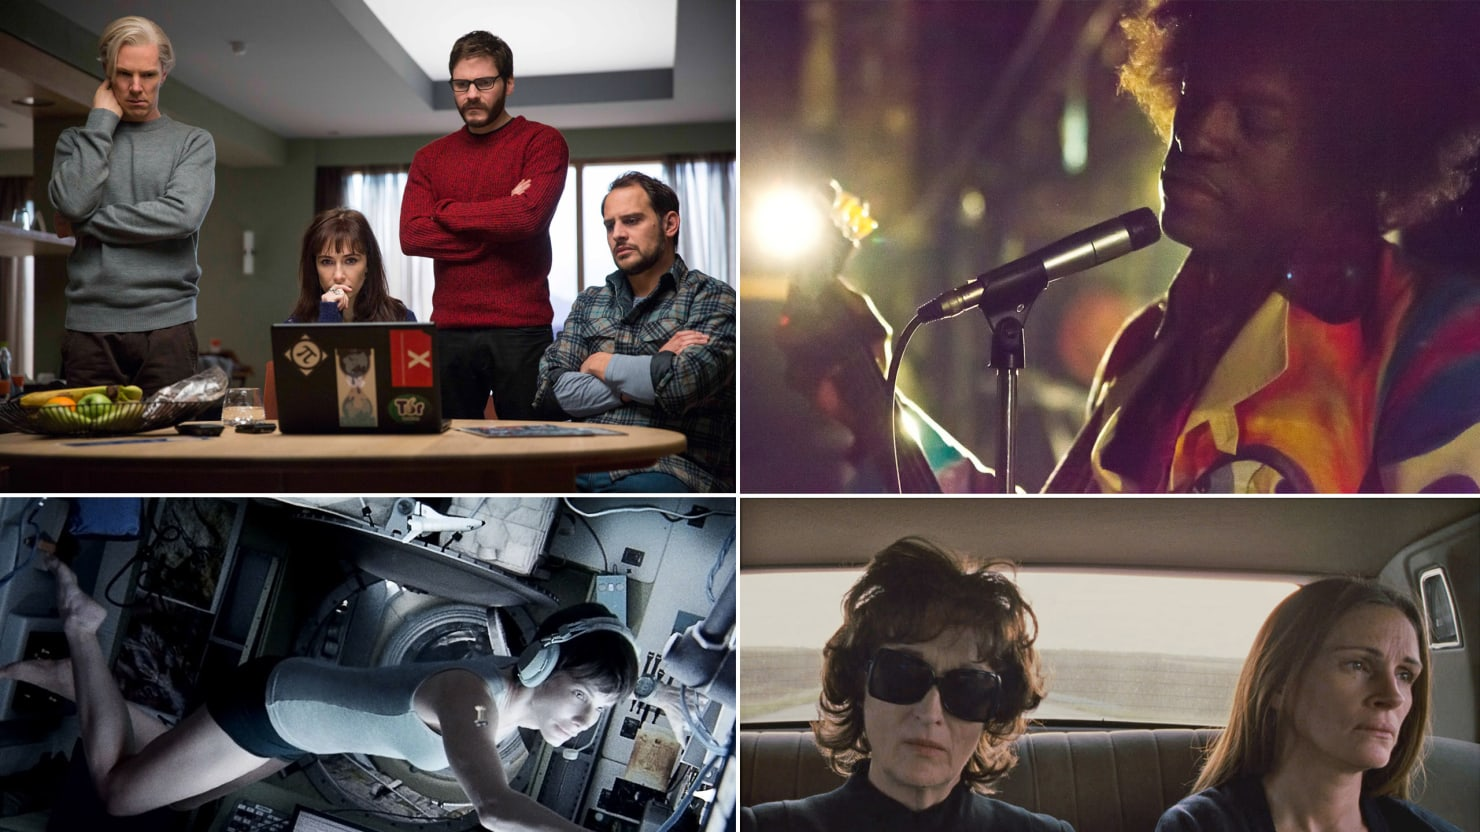 Toronto International Film Festival Preview: 'The Fifth Estate,' More